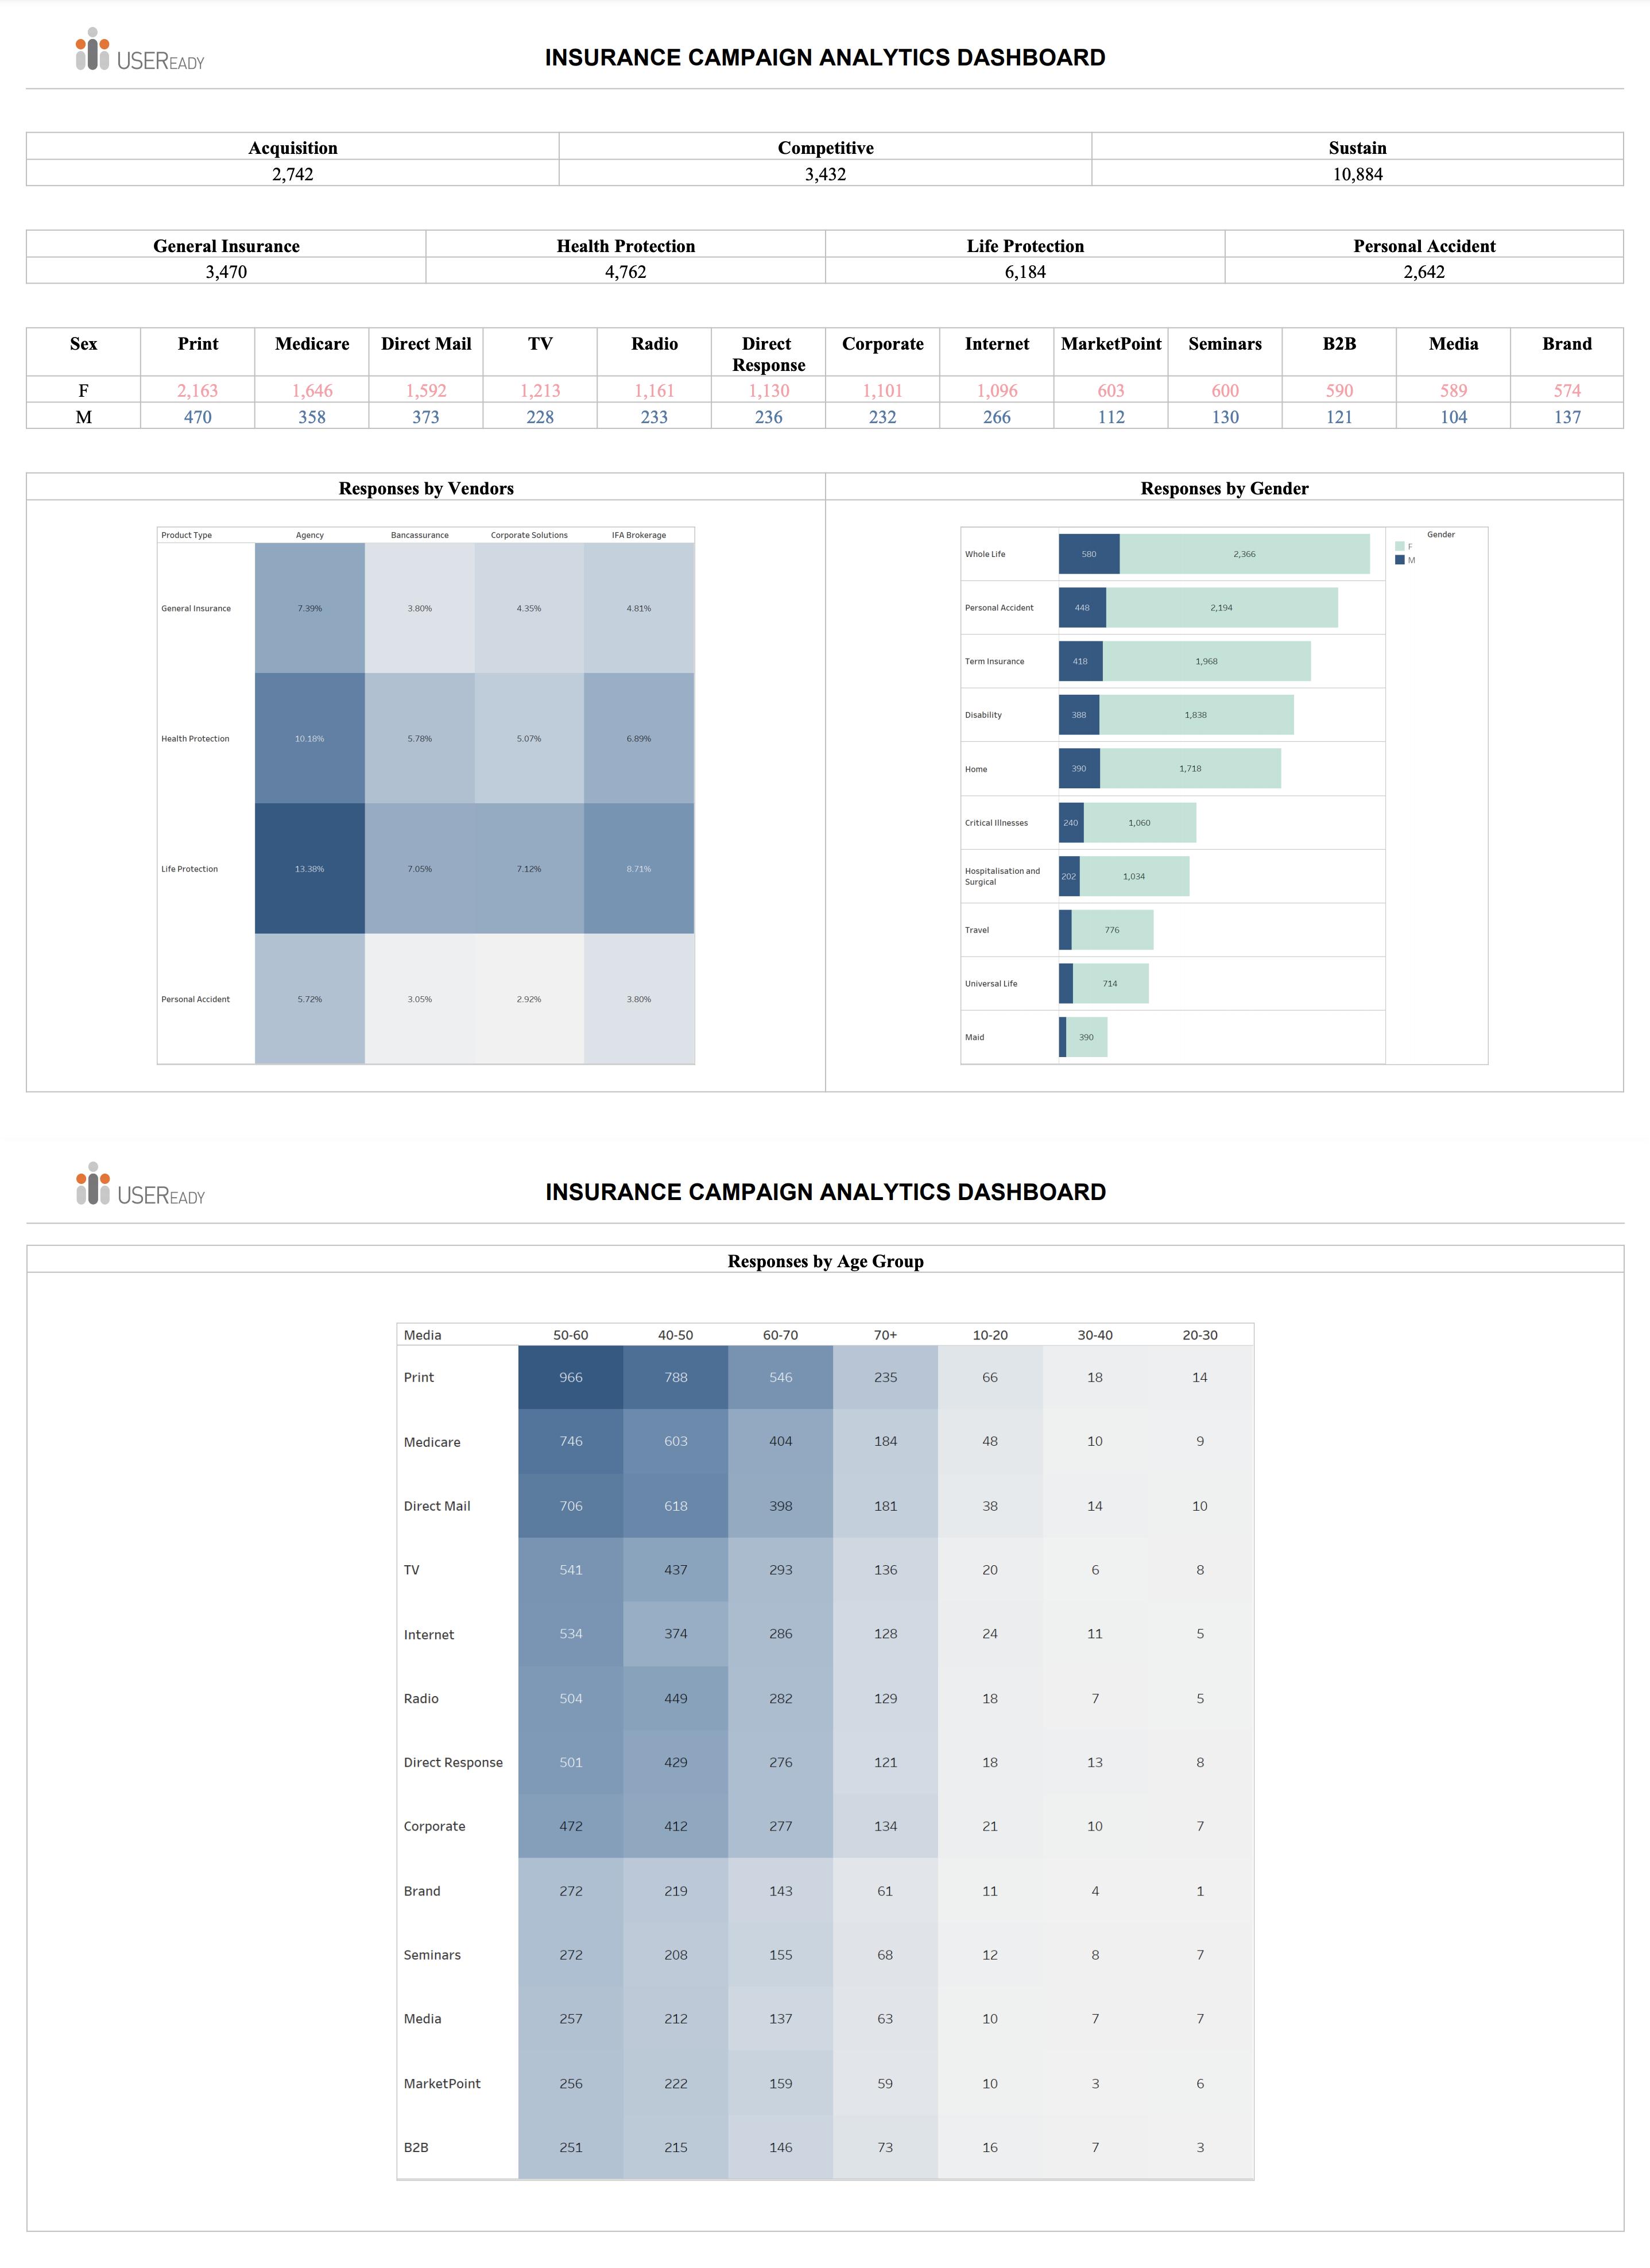 Insurance Campaign Analytics Report